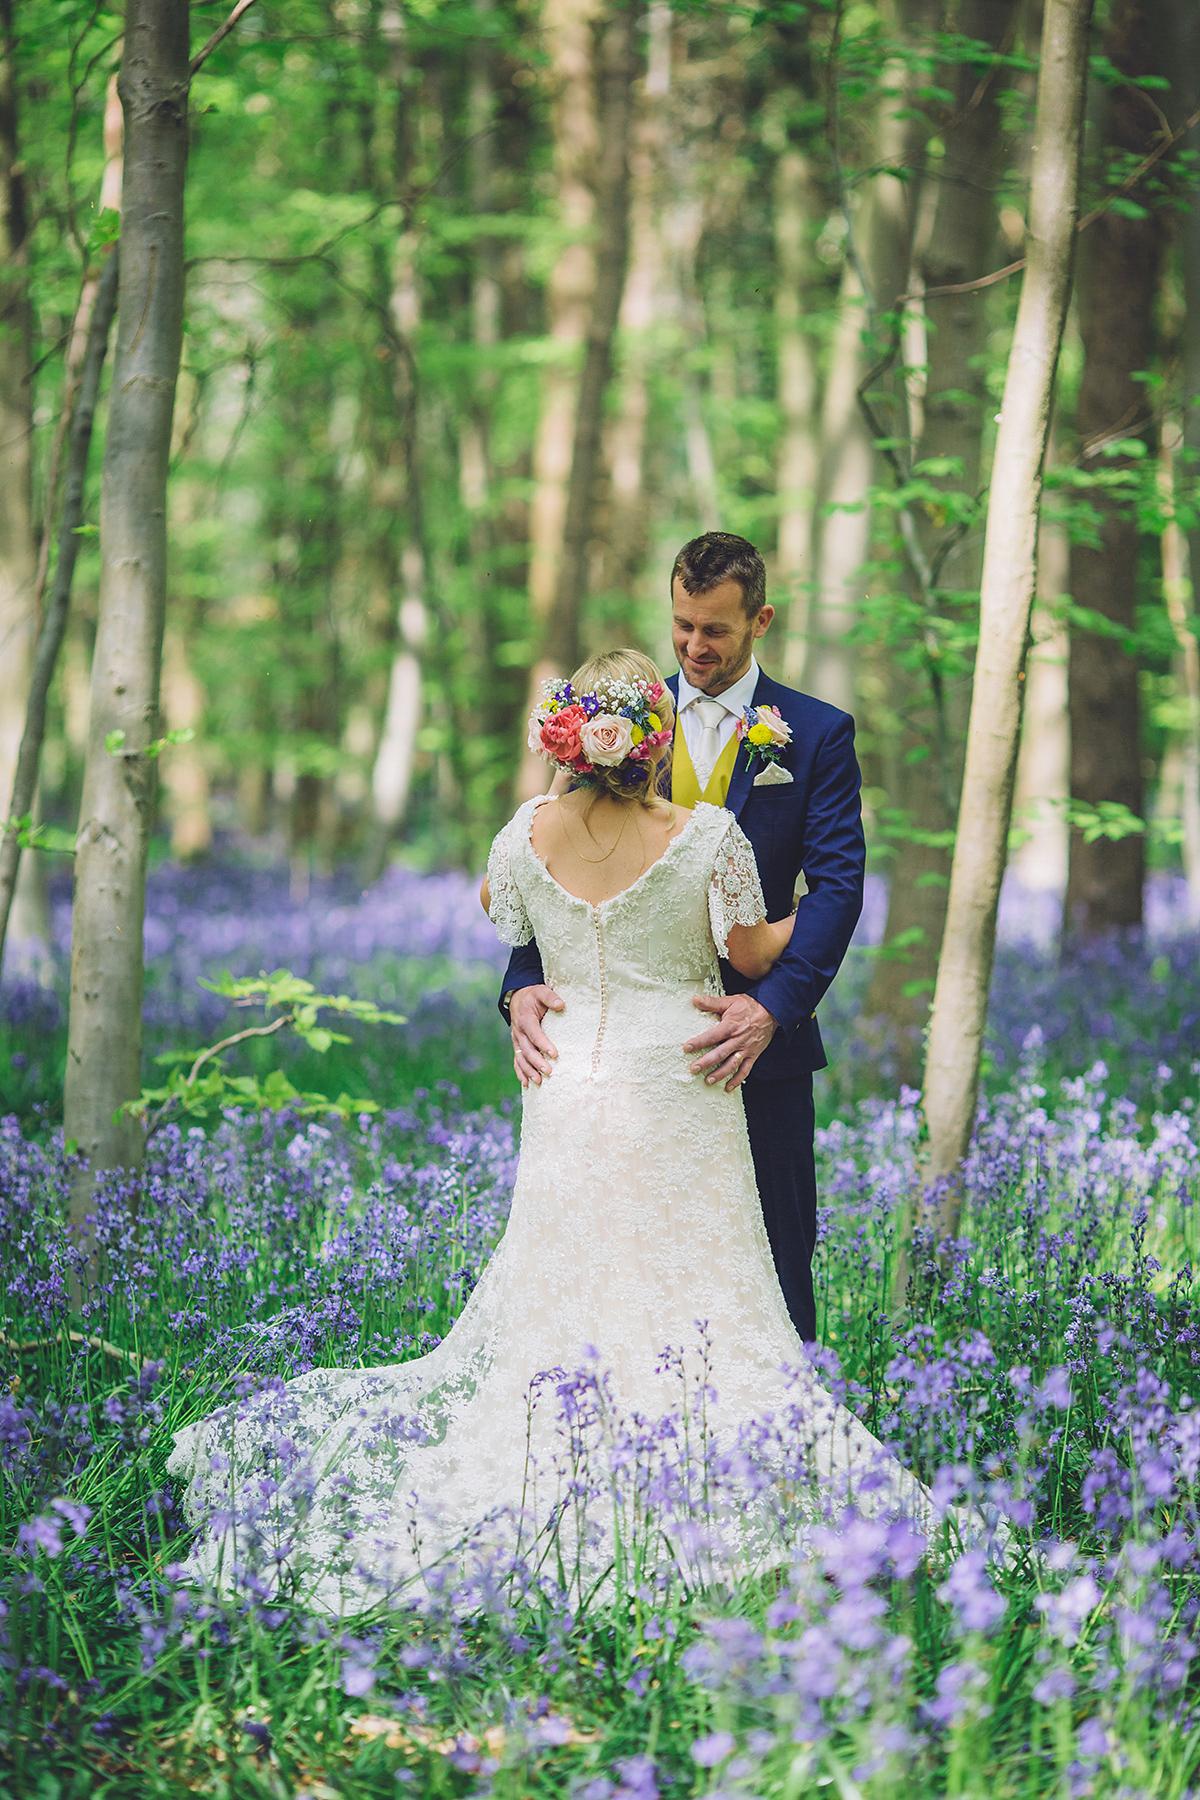 colourful whimsical bluebells woodland wedding woodland wedding dress A Bridal Boutique Owner s Colourful and Whimsical Woodland Wedding Amidst The Bluebells Weddings